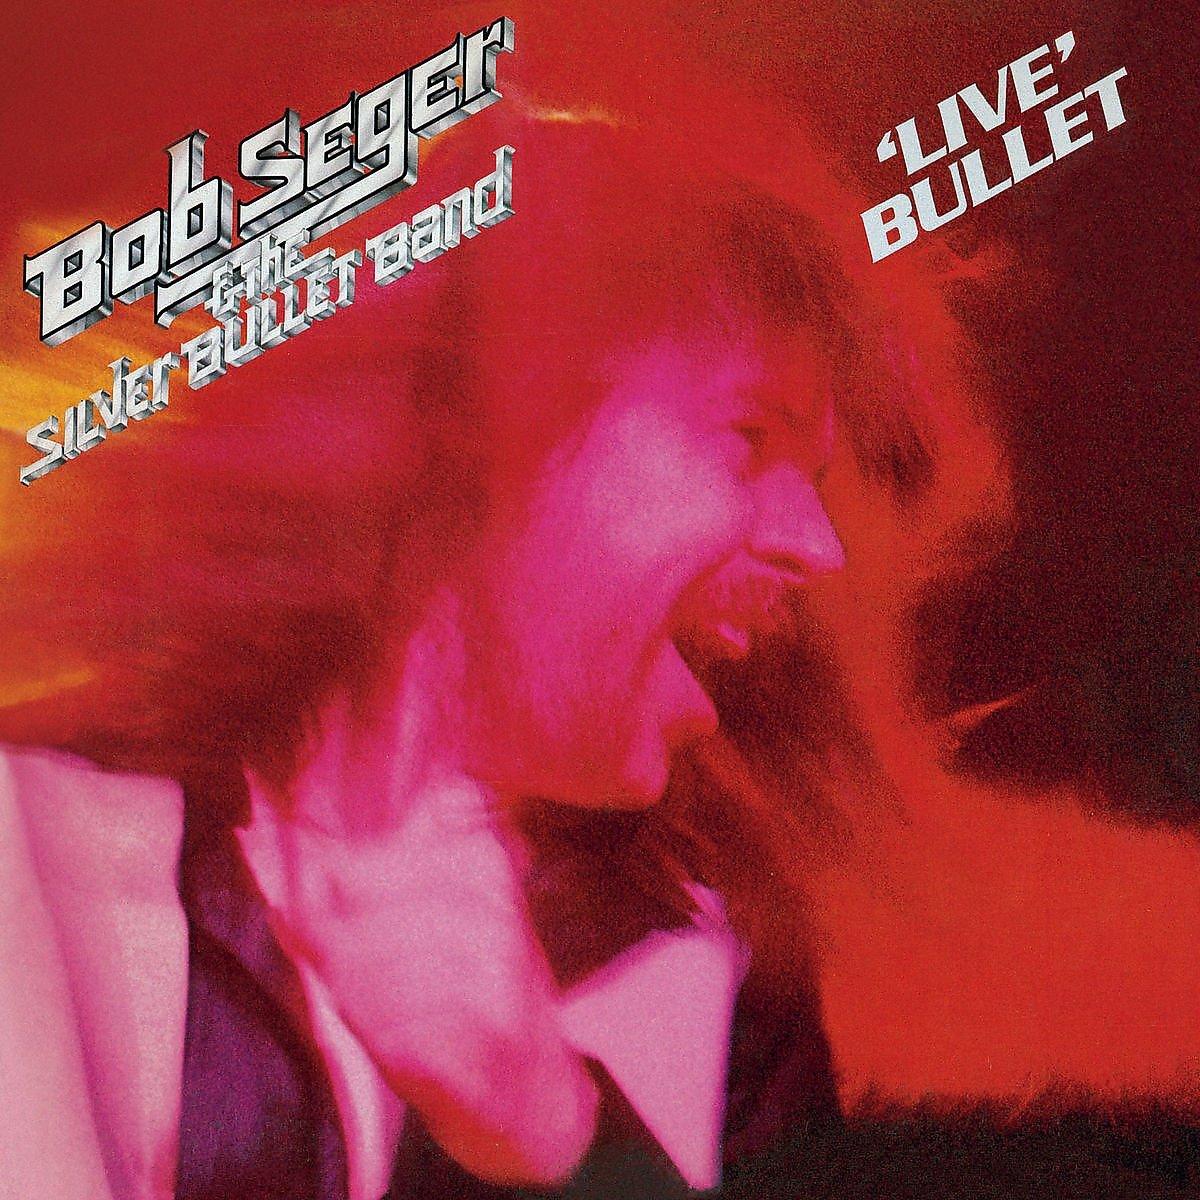 CD : Bob Seger - Live Bullet (Bonus Track, Remastered)